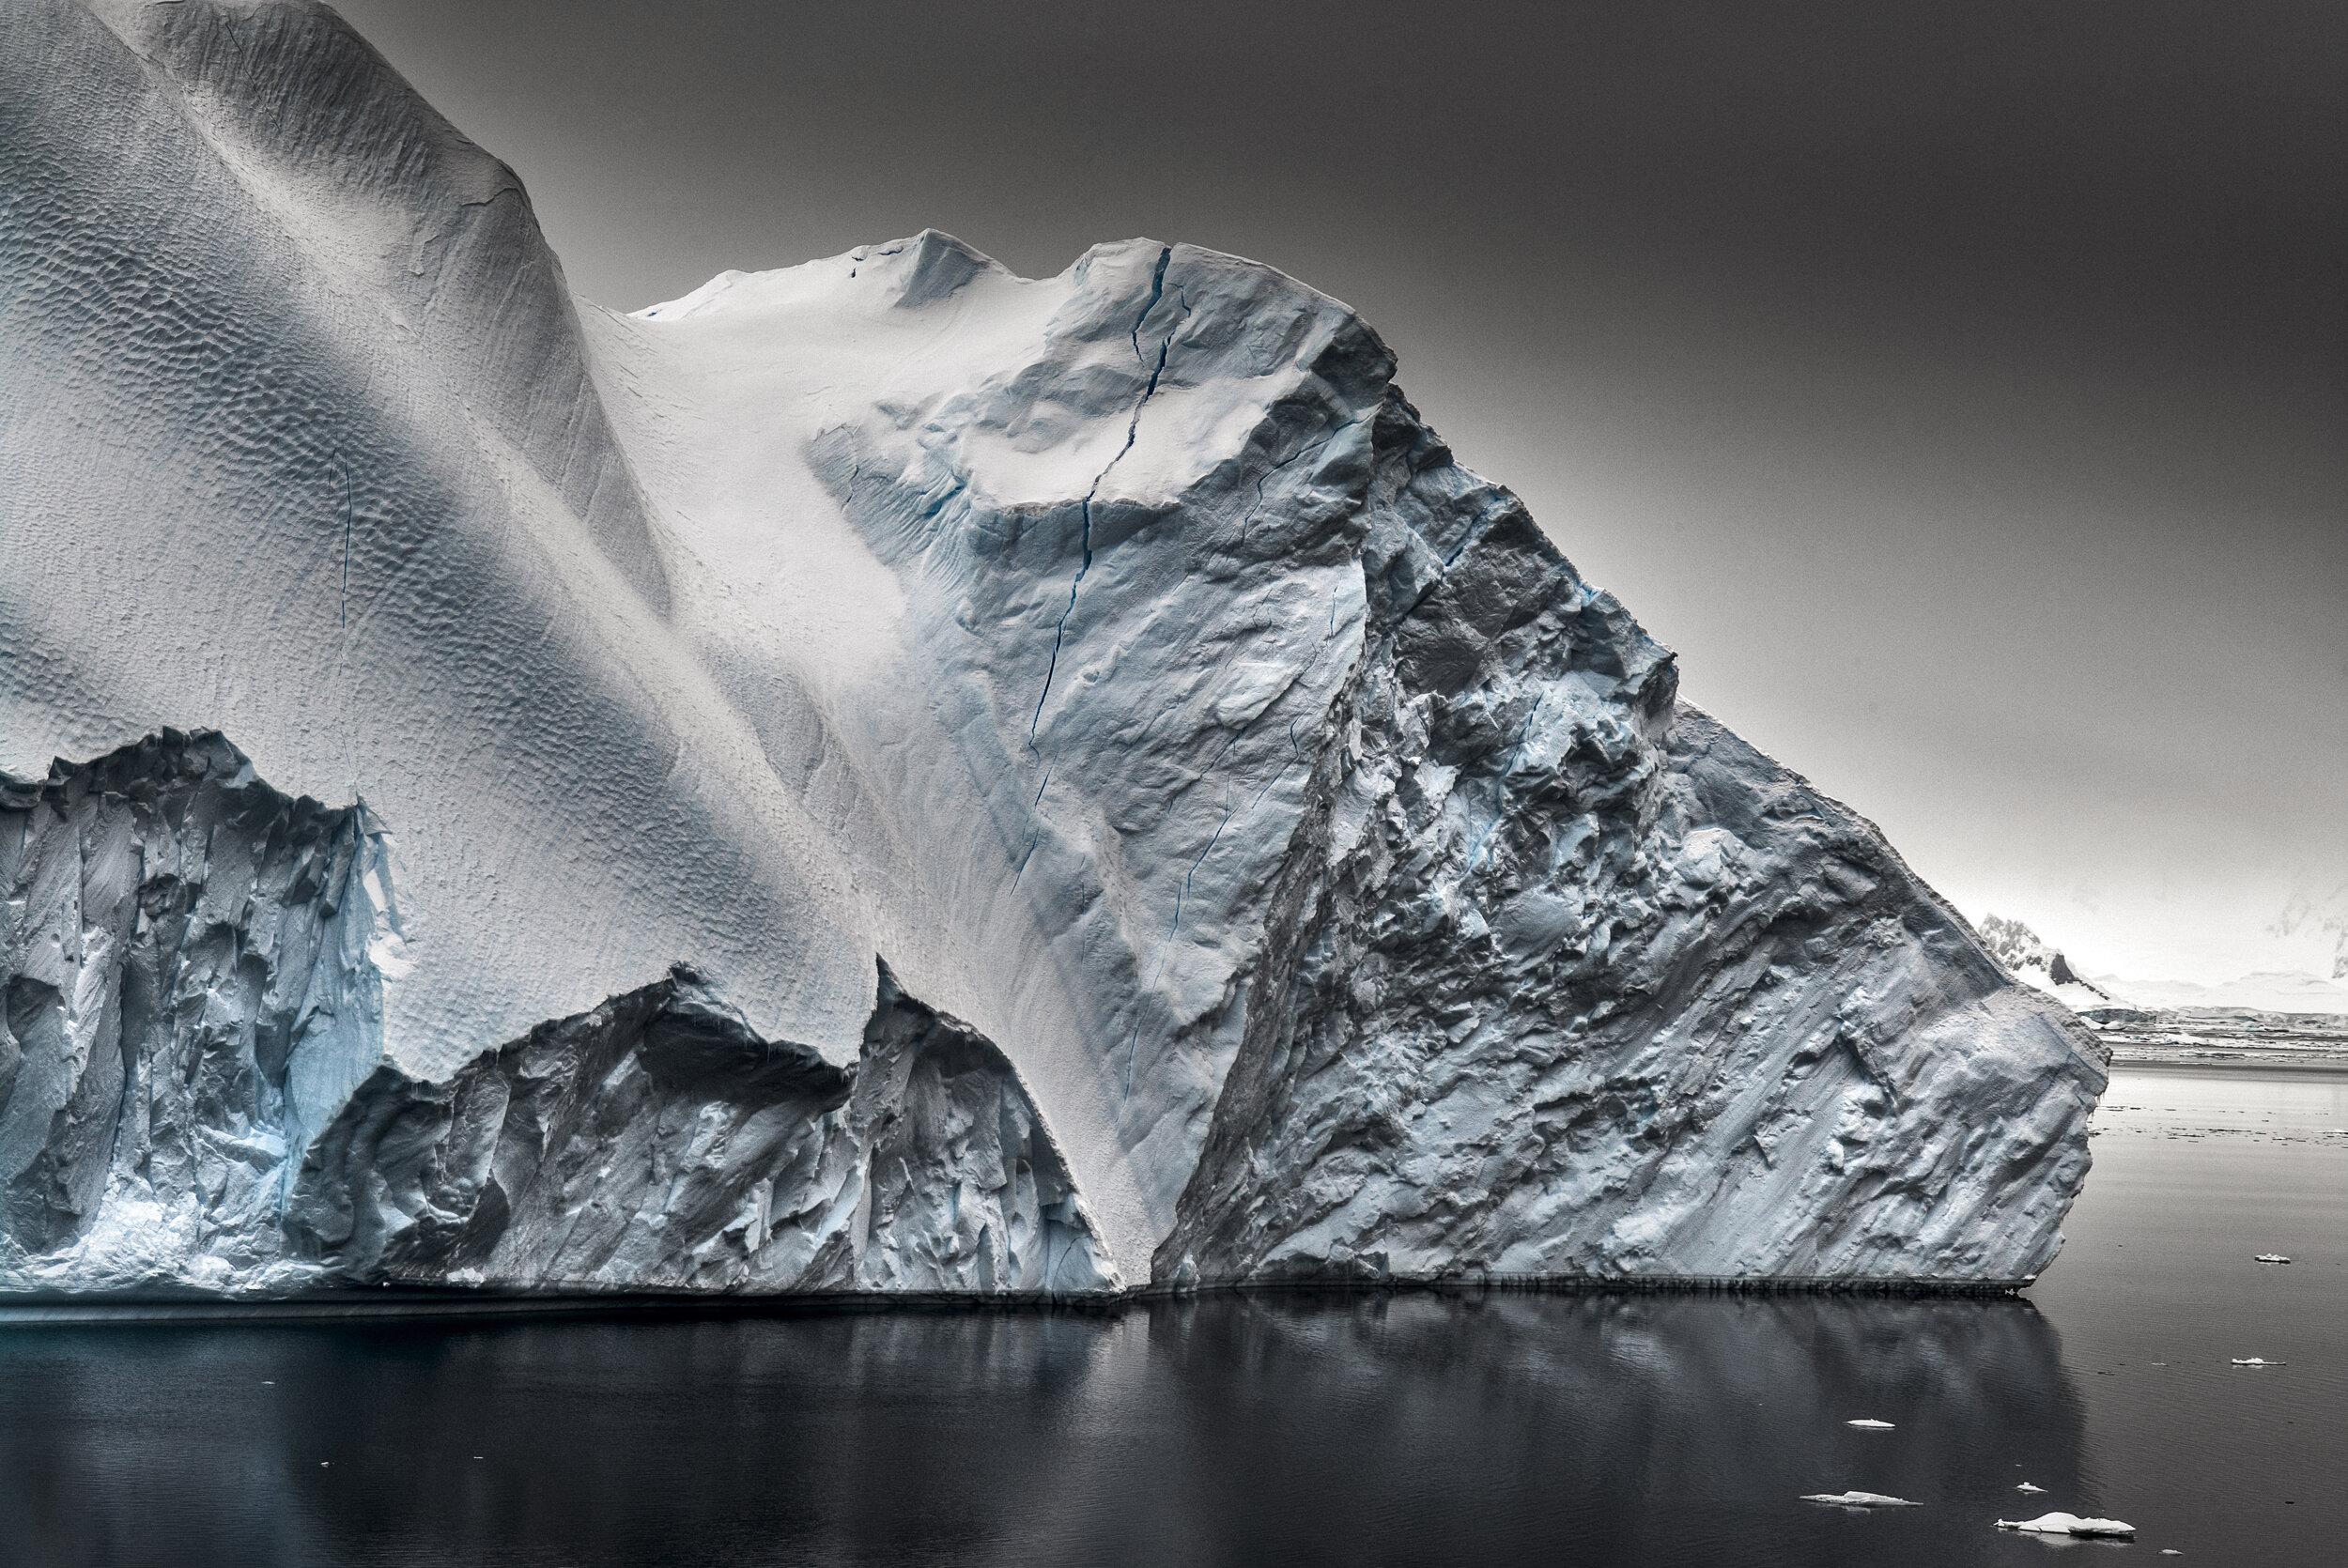 manuel_uebler_antarctica_twilight_004.jpg